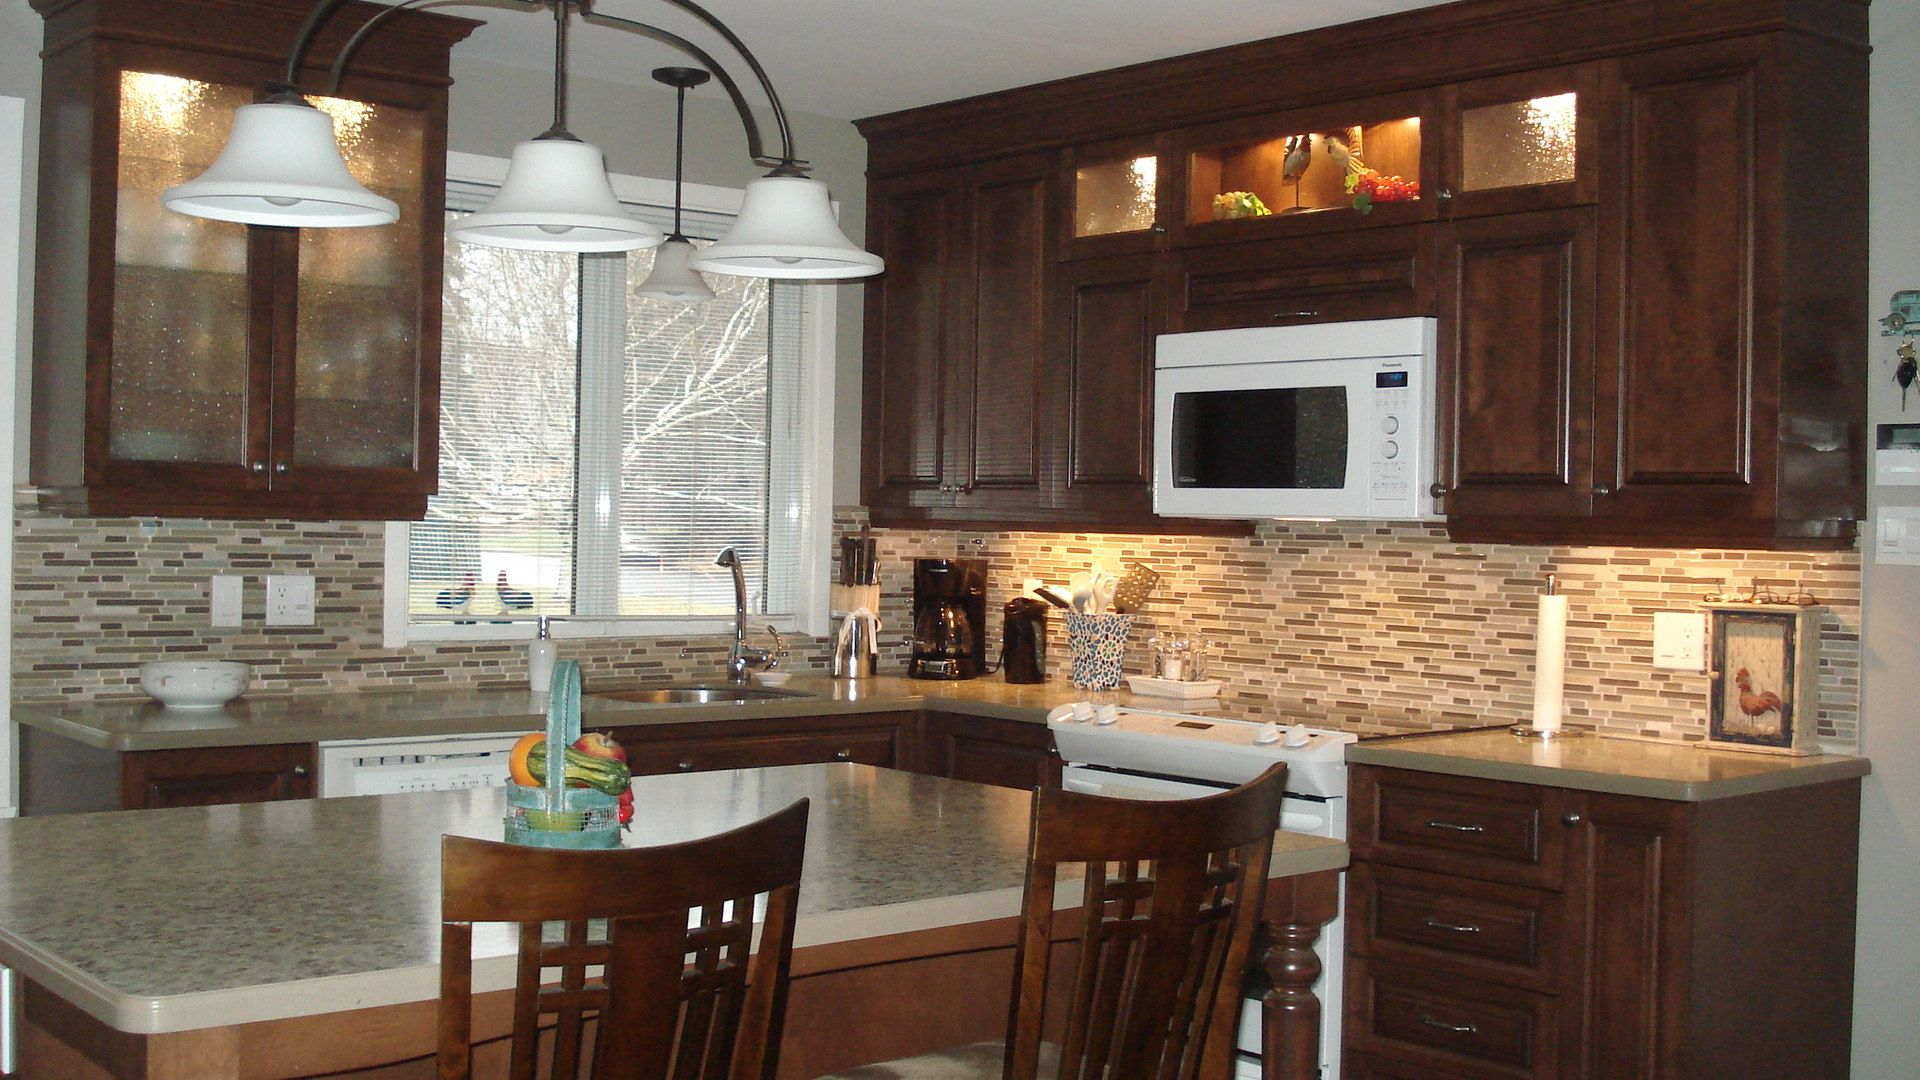 cuisine classique en merisier massif avec comptoir de stratifi designer karine poitras. Black Bedroom Furniture Sets. Home Design Ideas